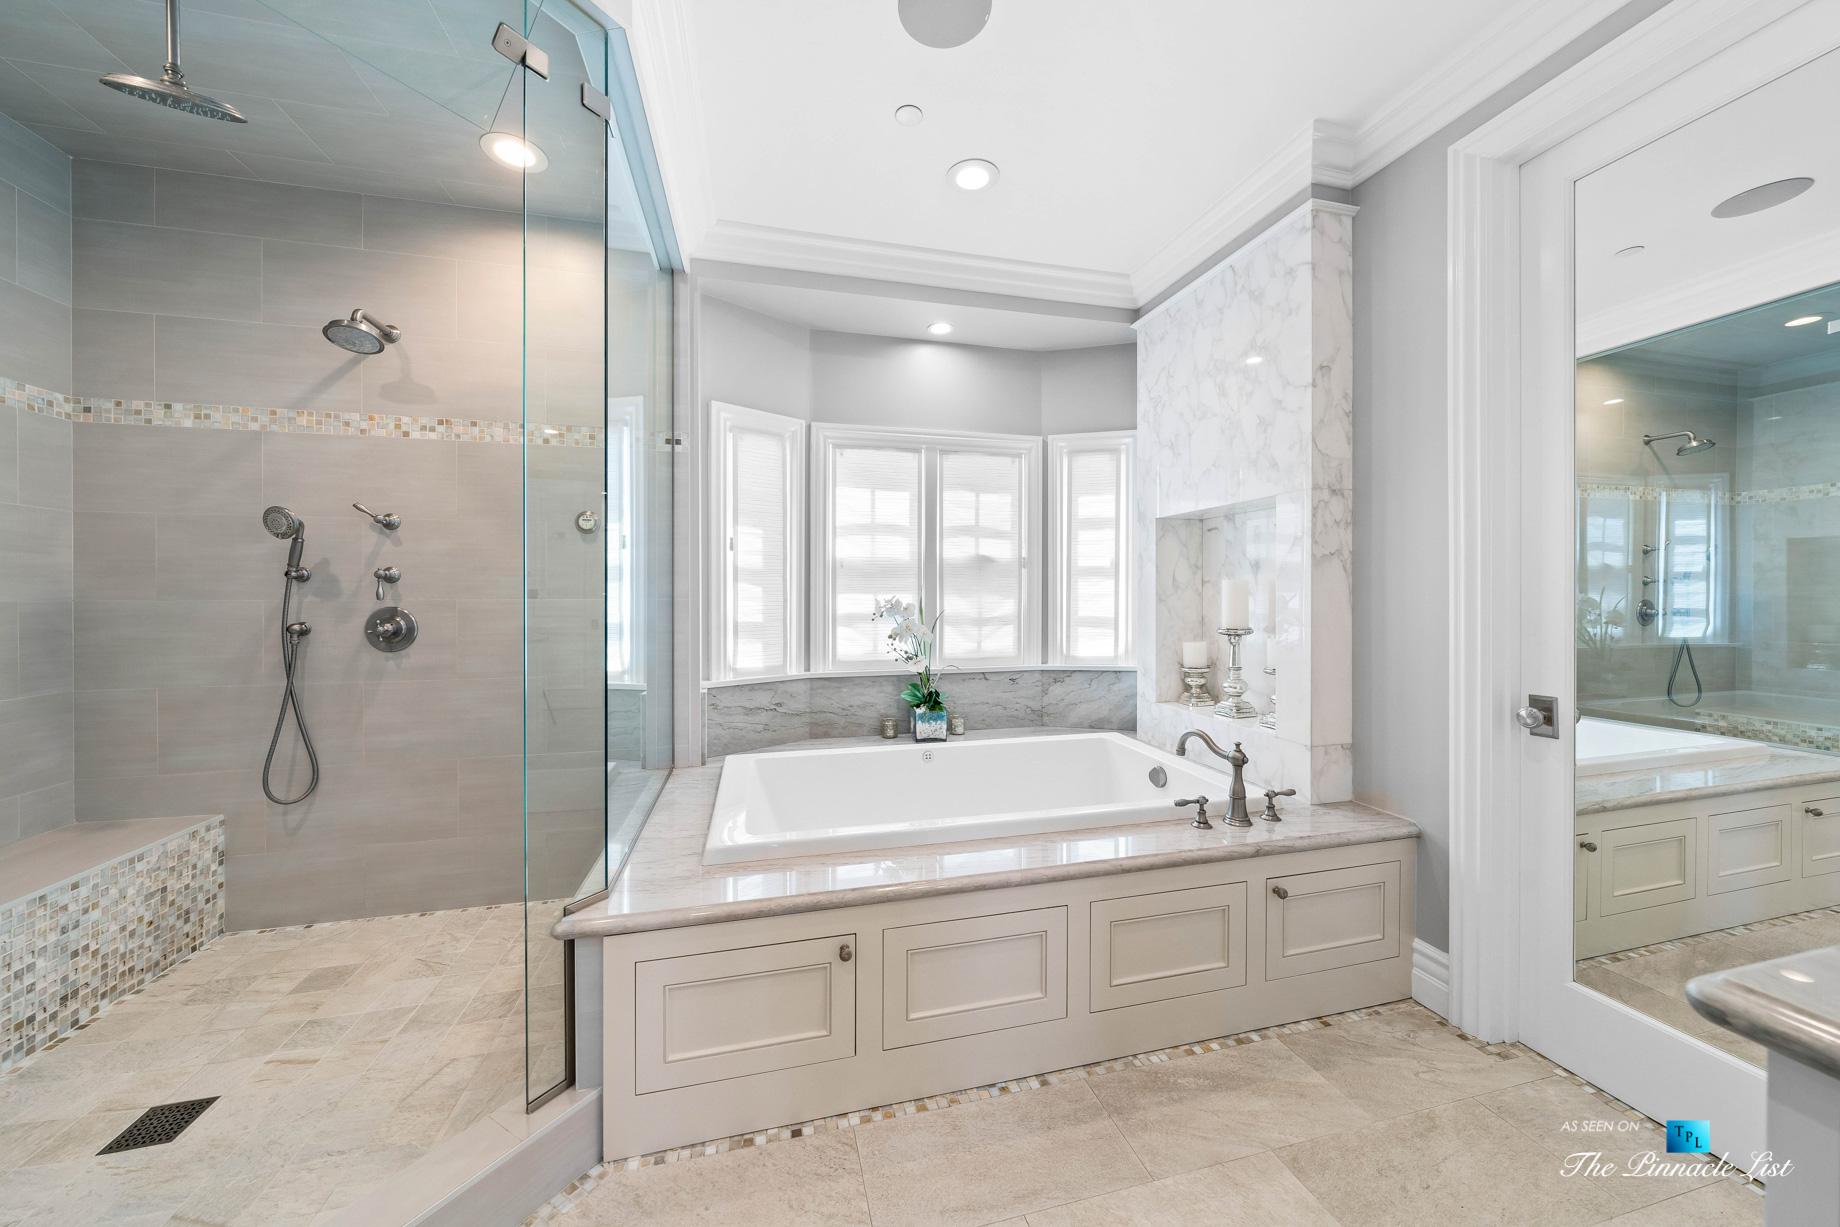 1412 Laurel Ave, Manhattan Beach, CA, USA – Master Bathroom Shower and Tub